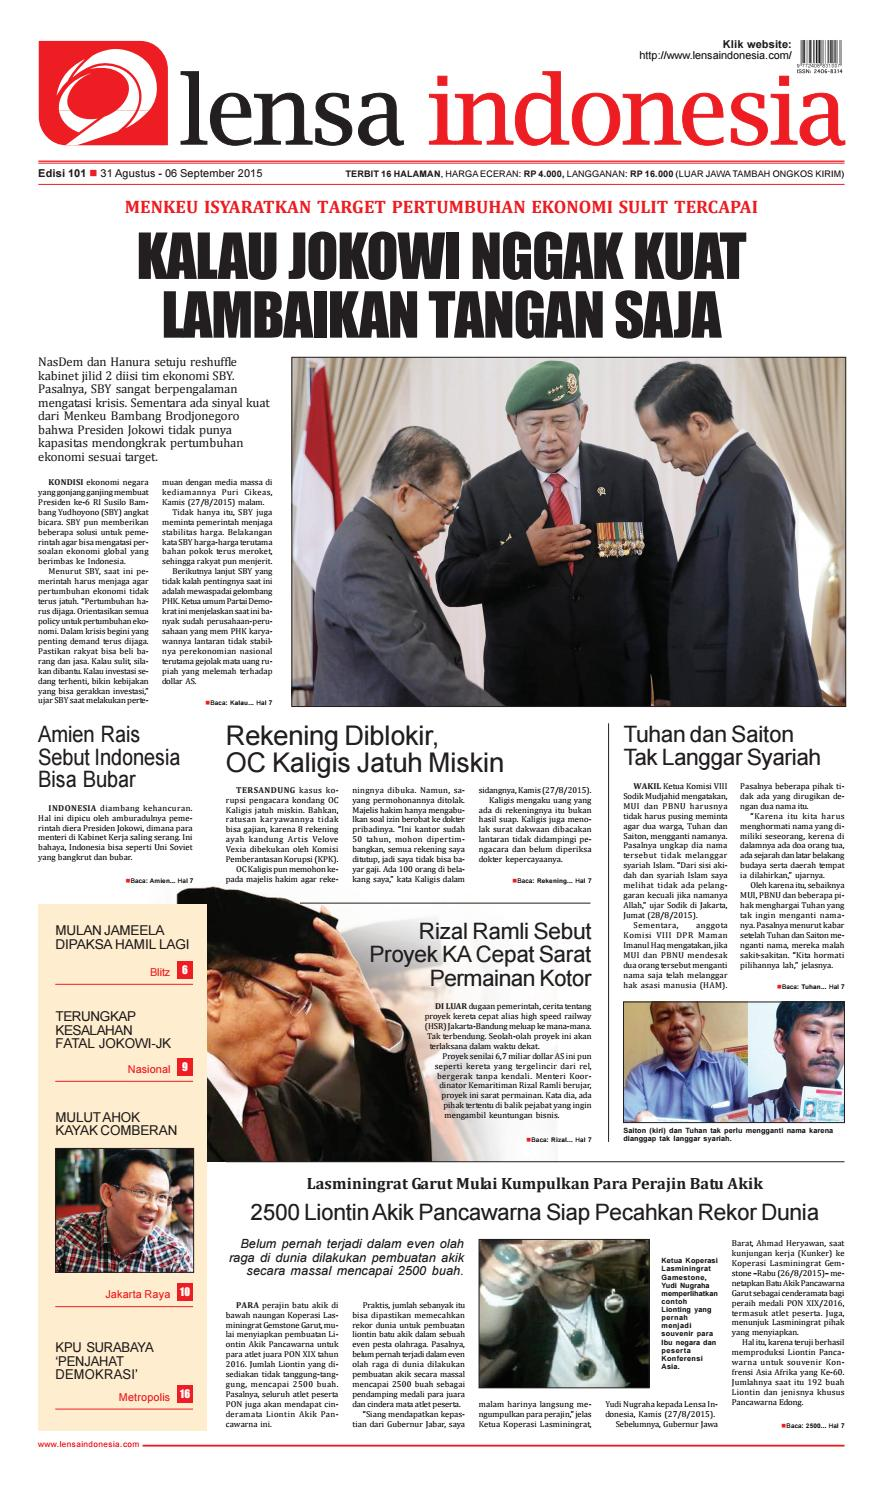 Koran Lensa Indonesia Edisi 101 by Koran Lensa Indonesia - issuu d24f08081f